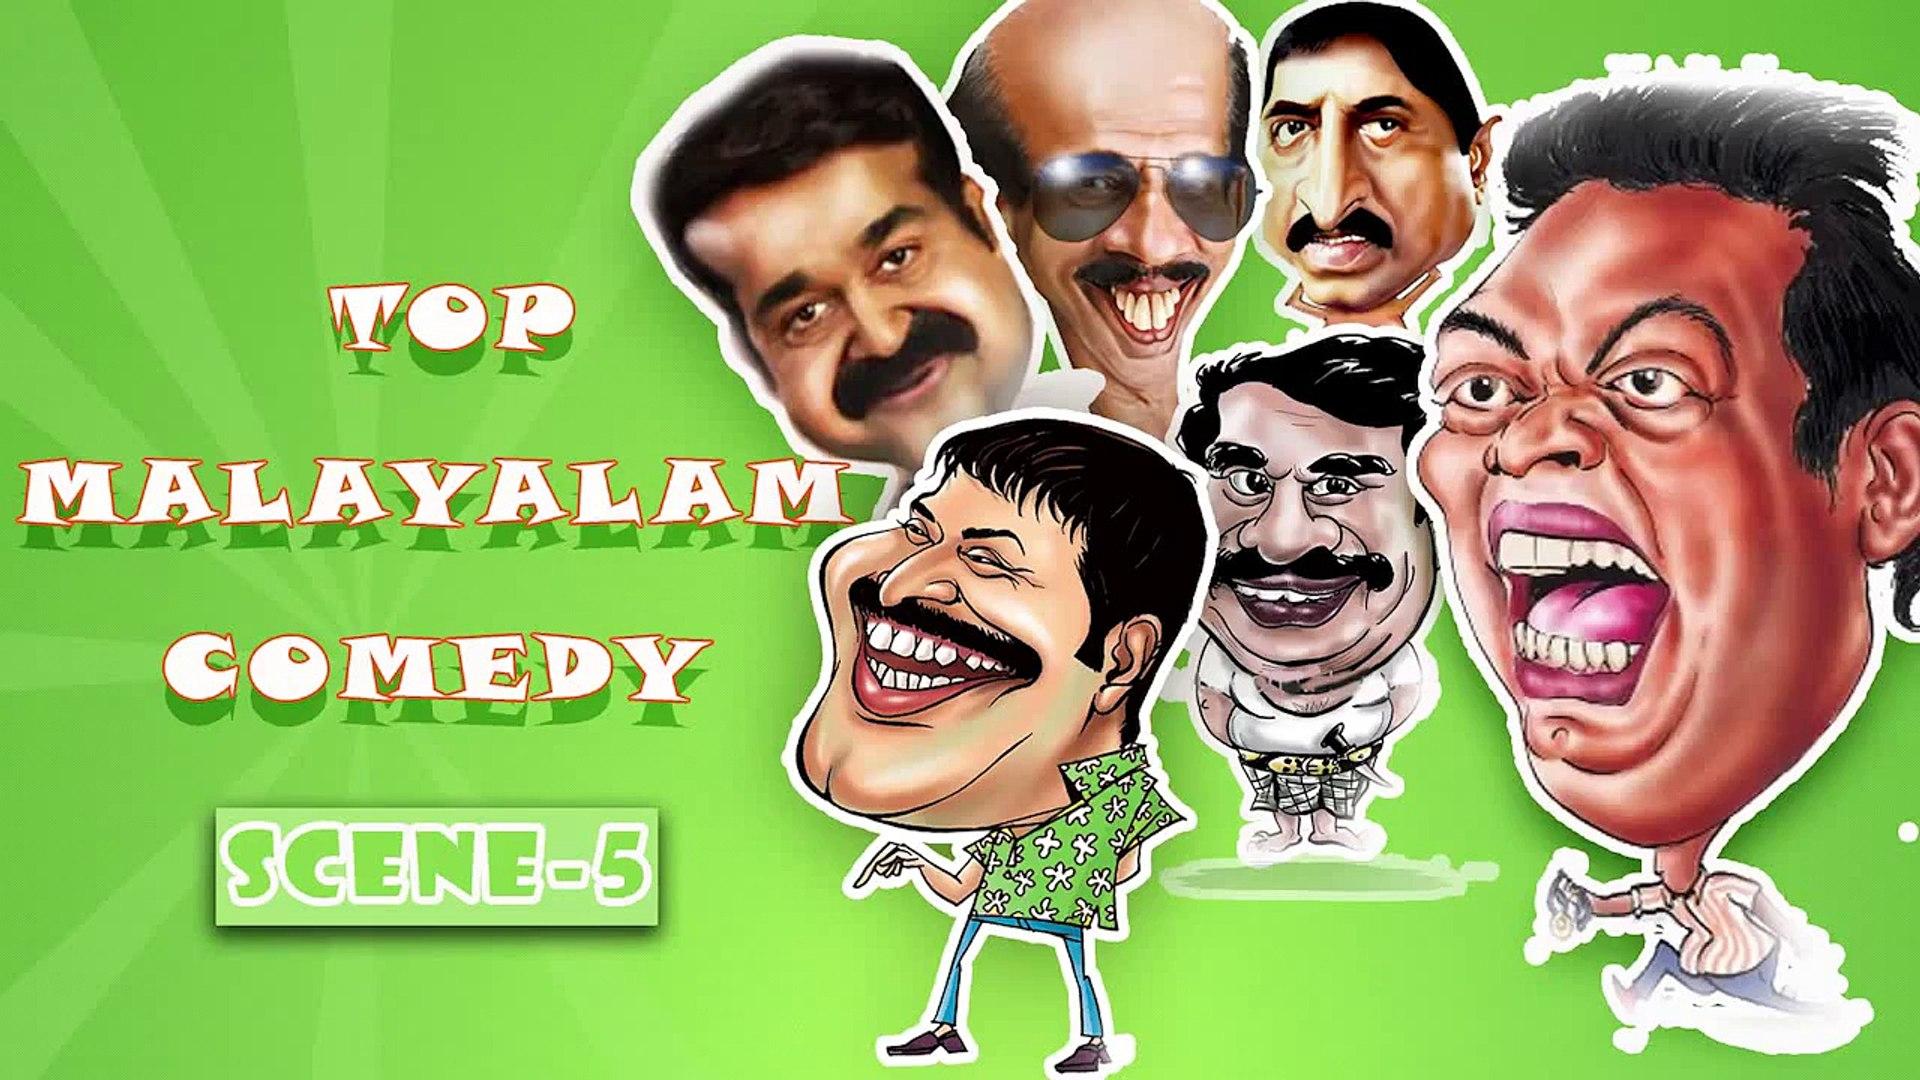 Malayalam Movie Top Comedy Scene 5 | Malayalam Comedy Scenes | Malayalam Movie Comedy Scen